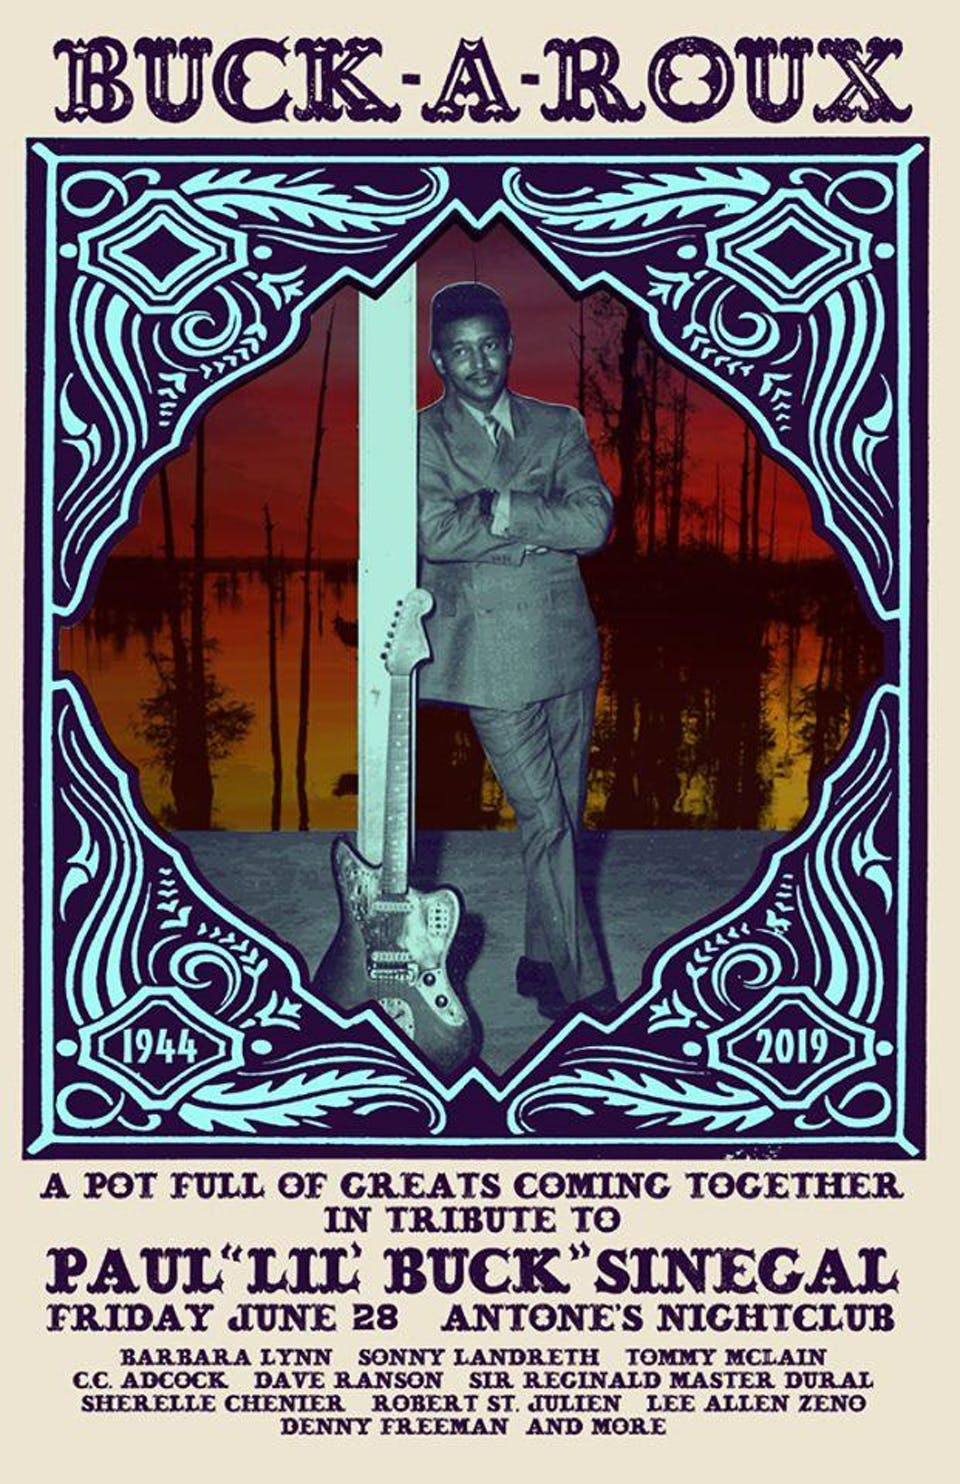 Lil' Buck Tribute: Barbara Lynn, Sonny Landreth, Tommy McLain & C.C. Adcock